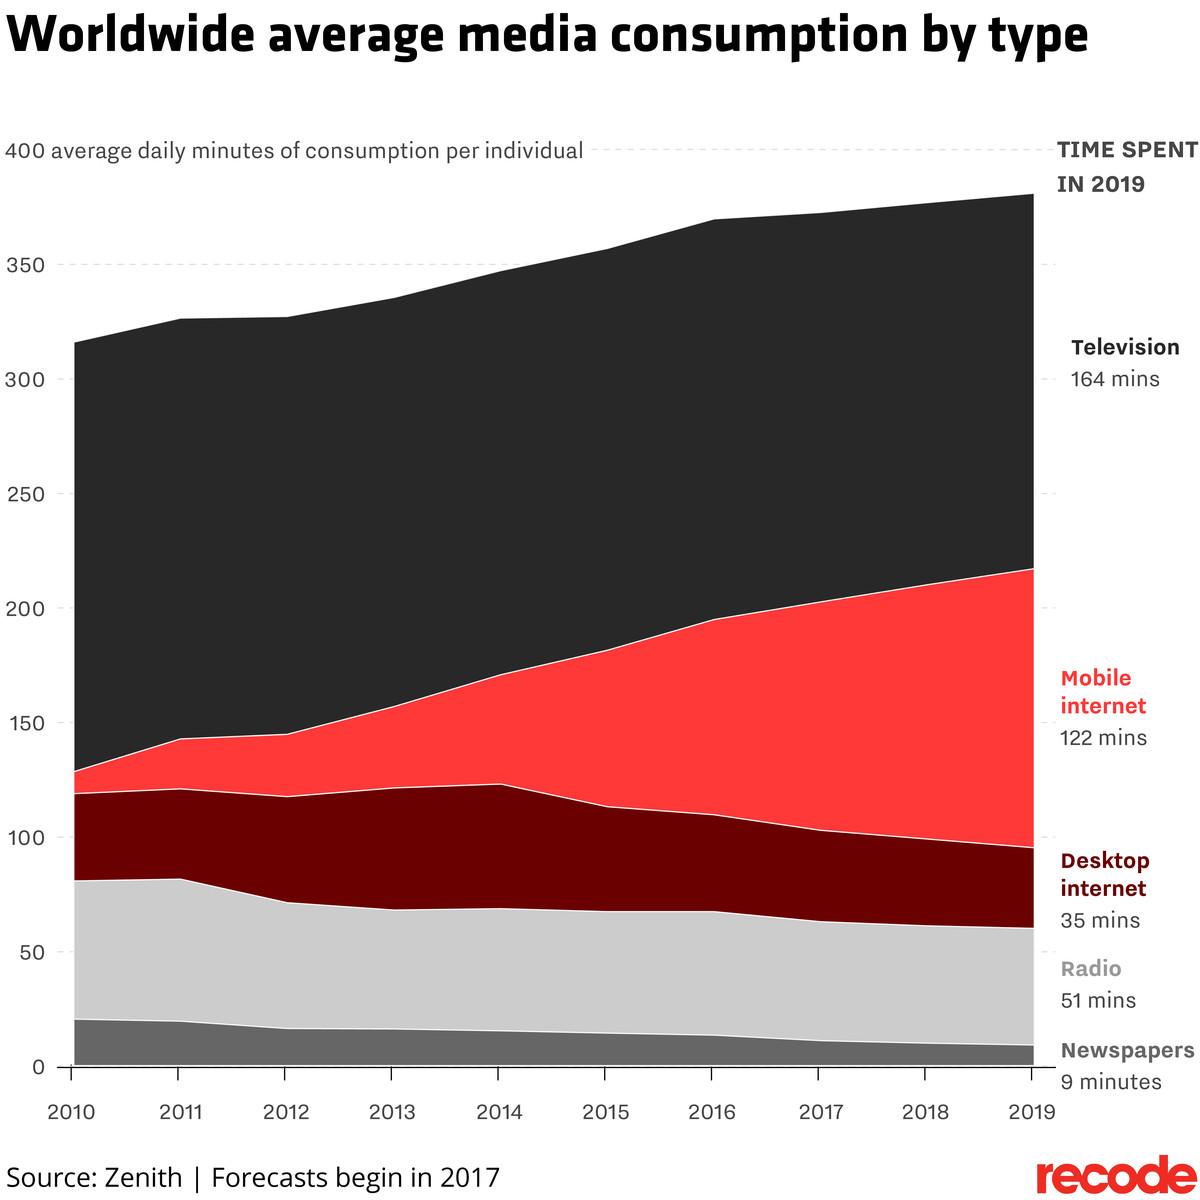 Worldwide average media consumption by type